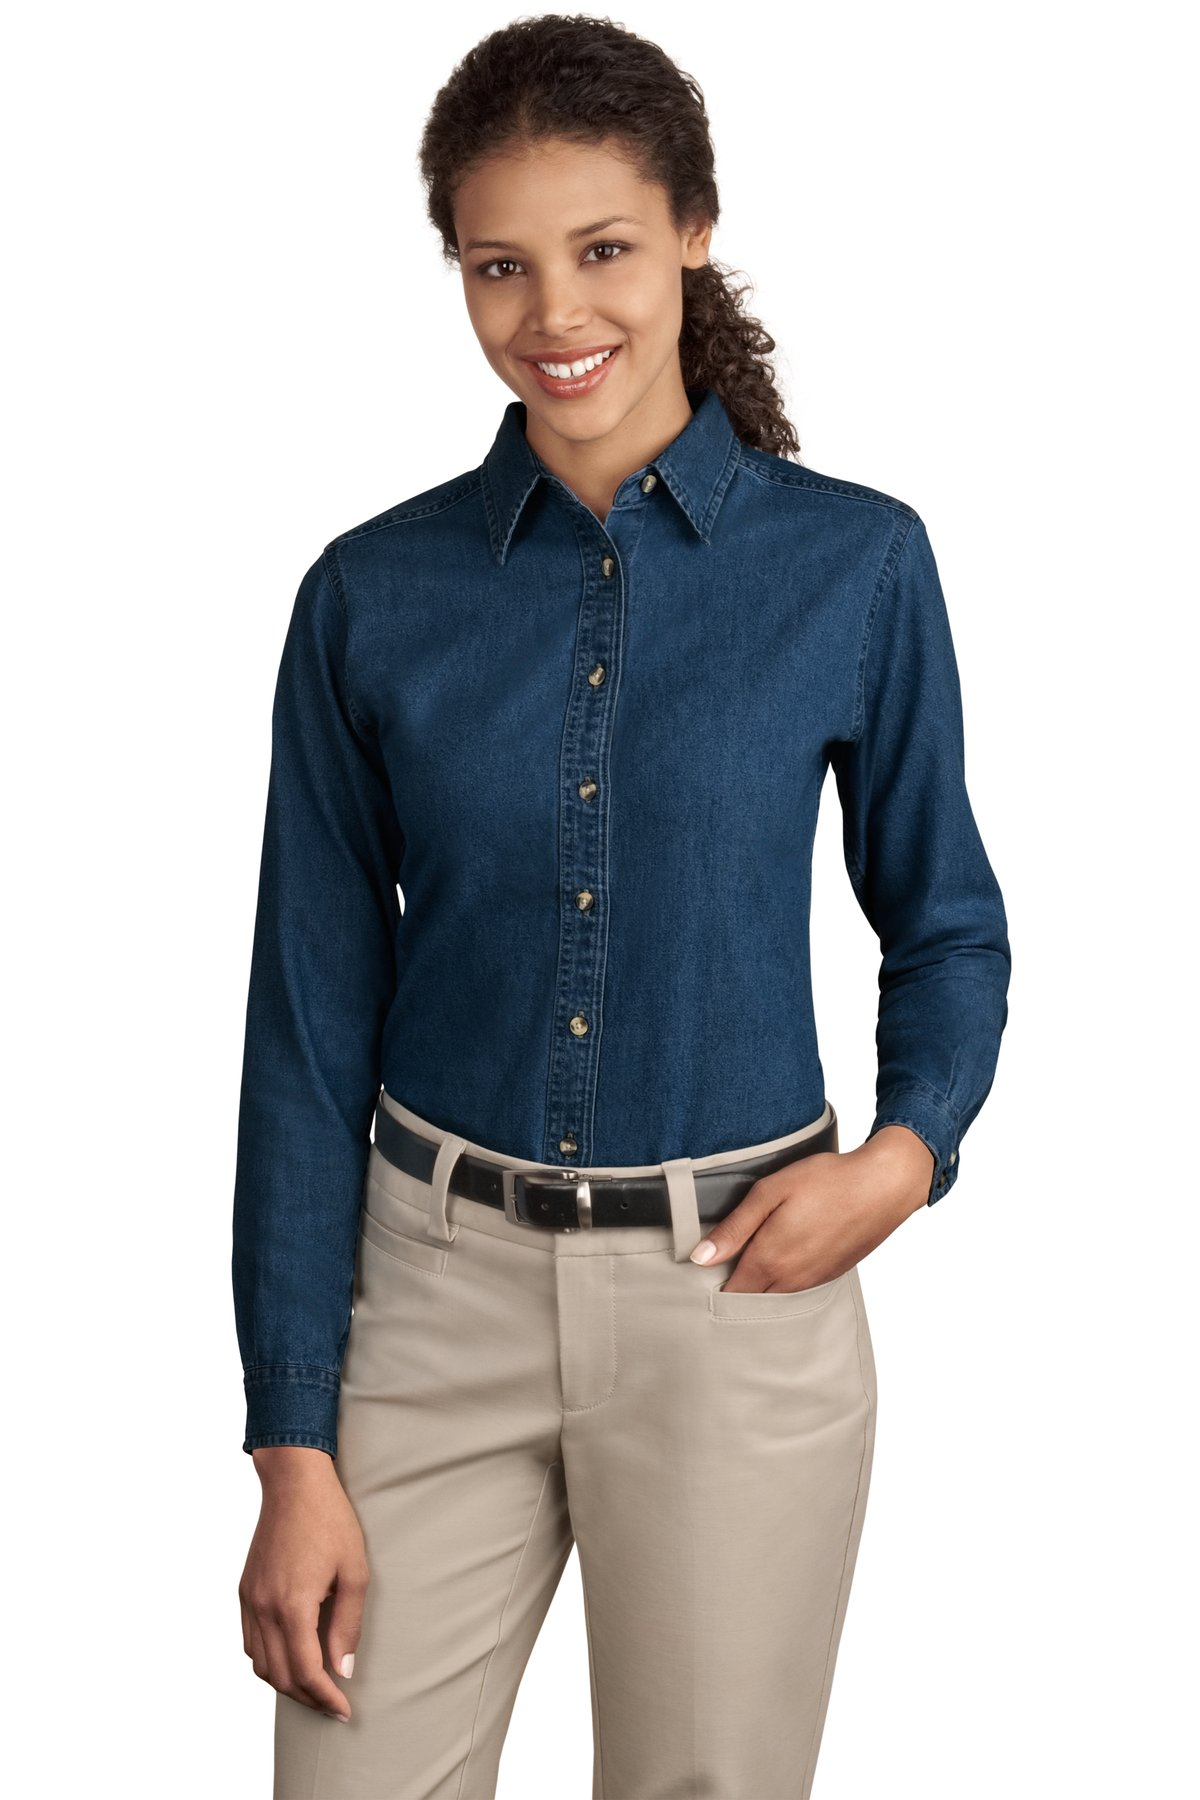 Woven-Shirts-Cotton-6